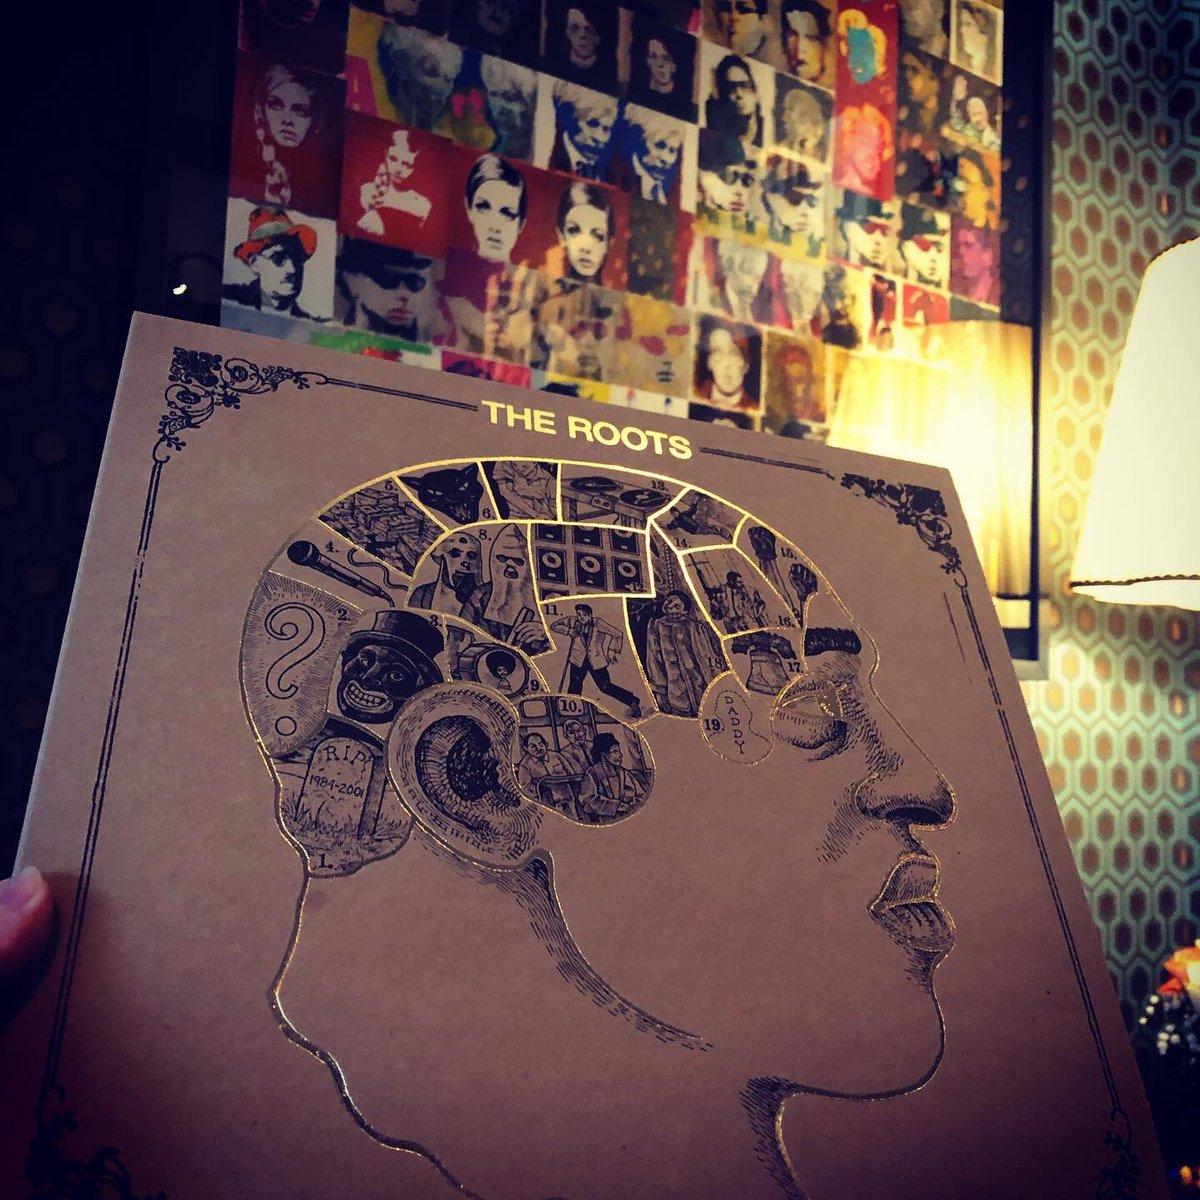 Recent deliveries from @vinylmeplease for the @gramovox #Castlebar #Mayo #vinyl #vinyloftheday #listeningsessionpic.twitter.com/zIRKfjtYZv